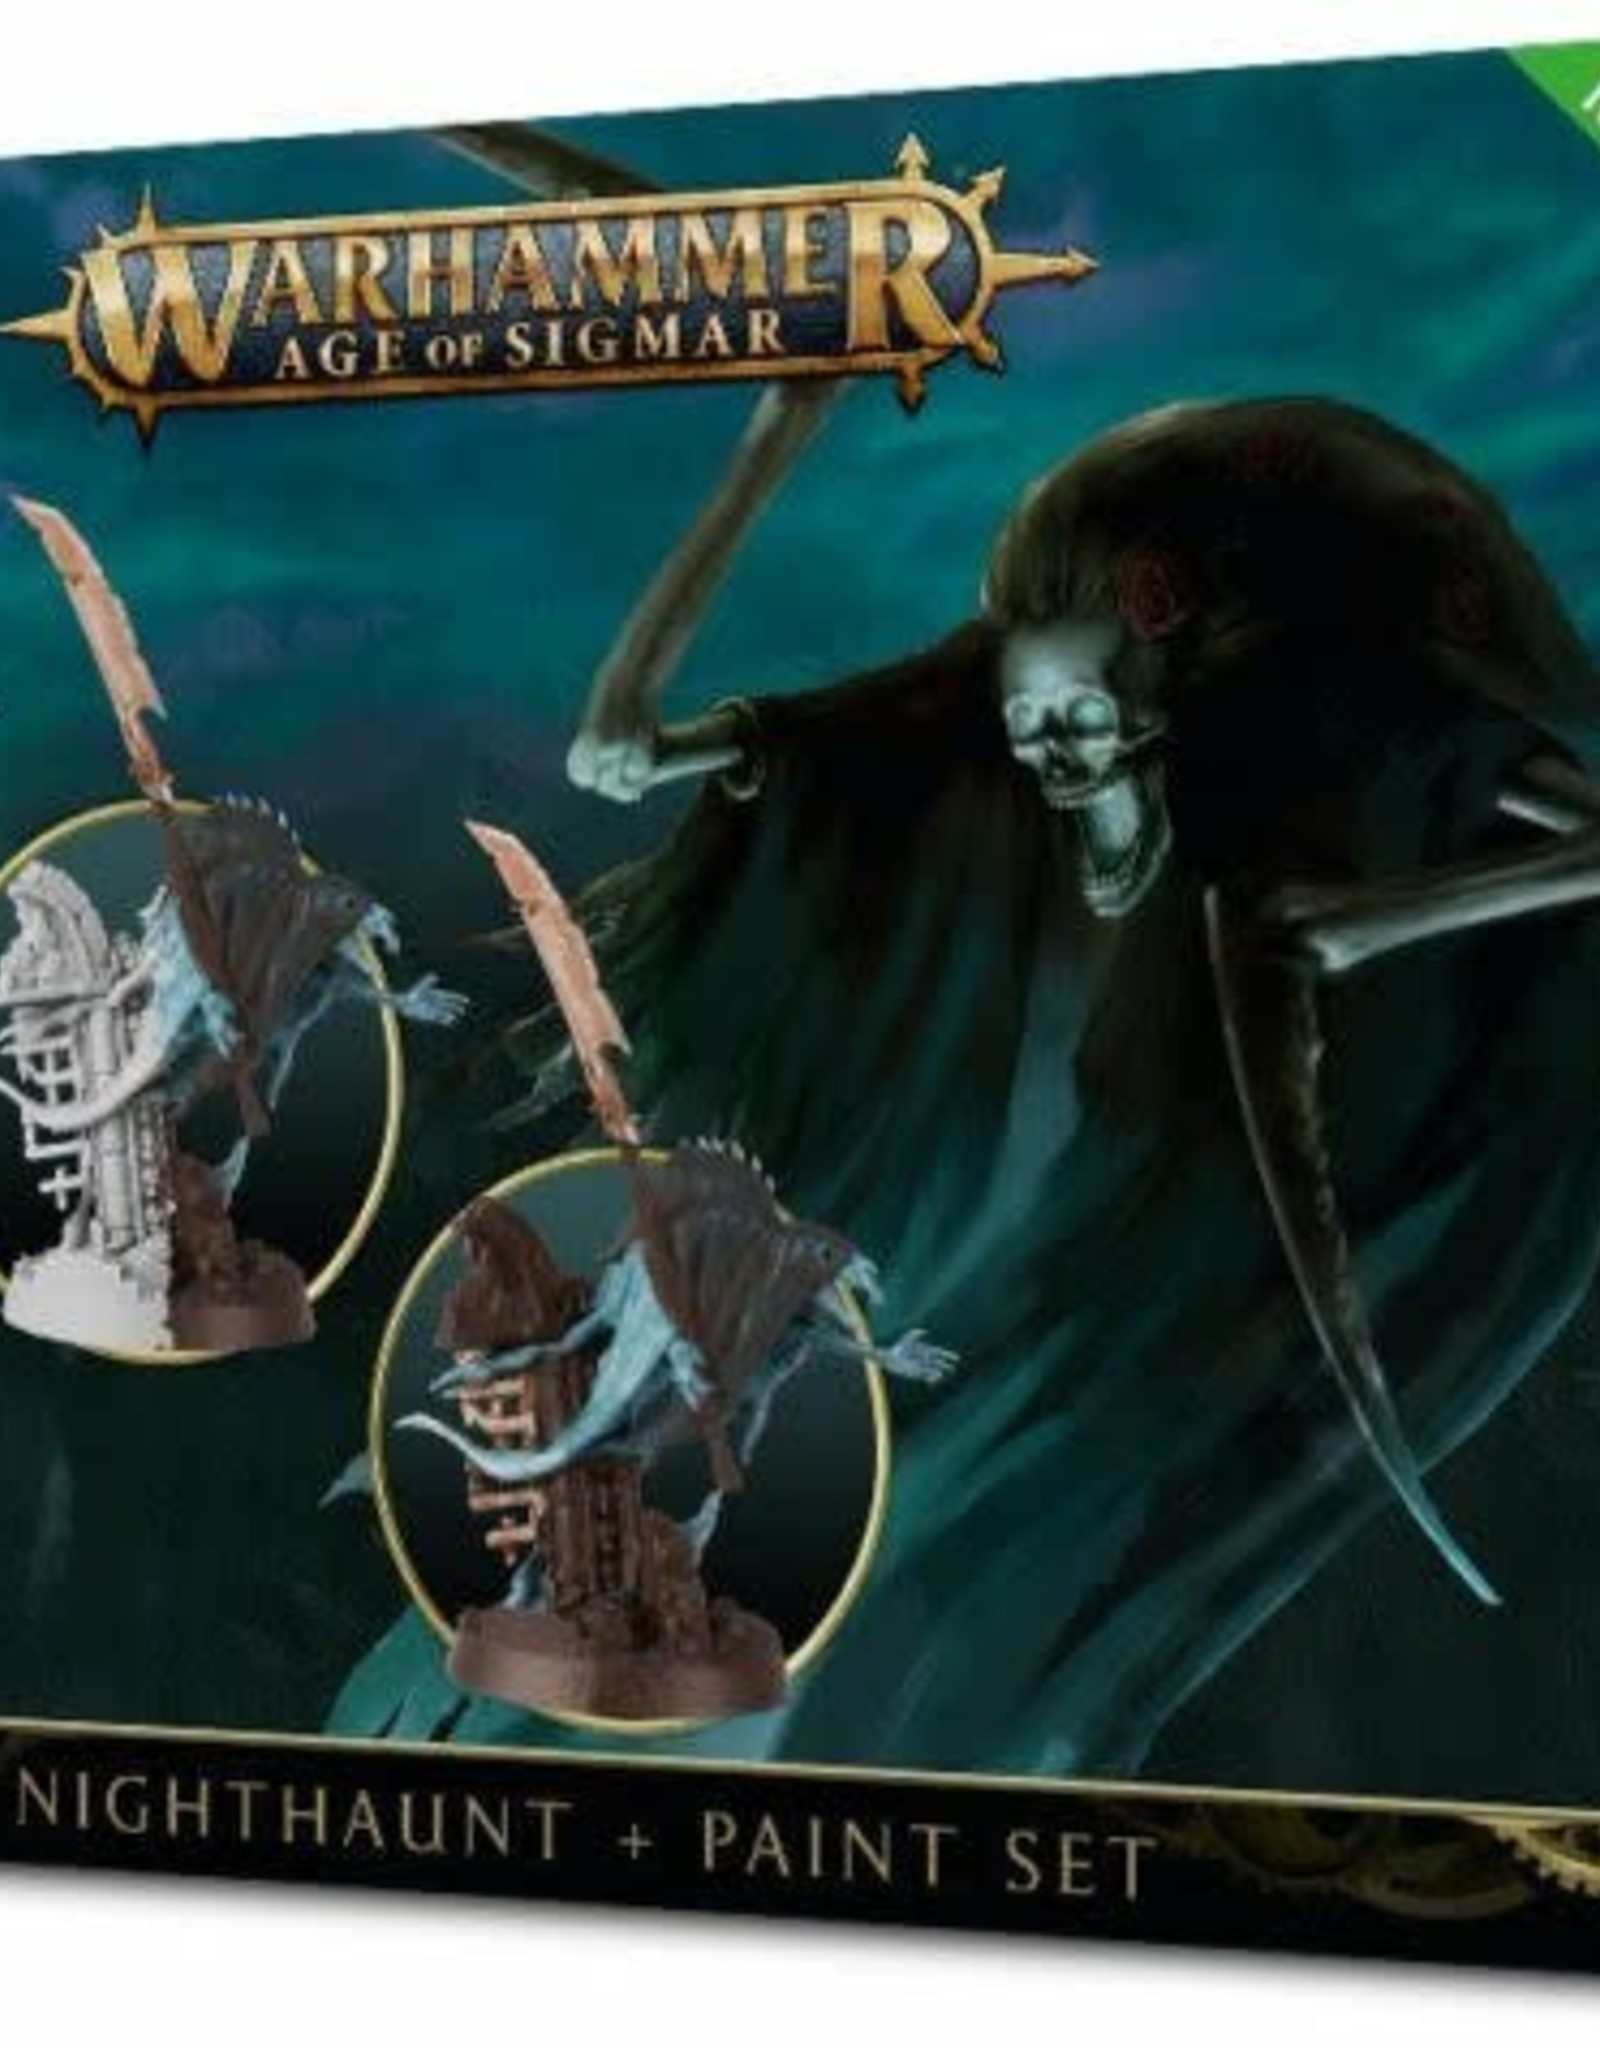 Games Workshop AoS Nighthaunt + Paint Set